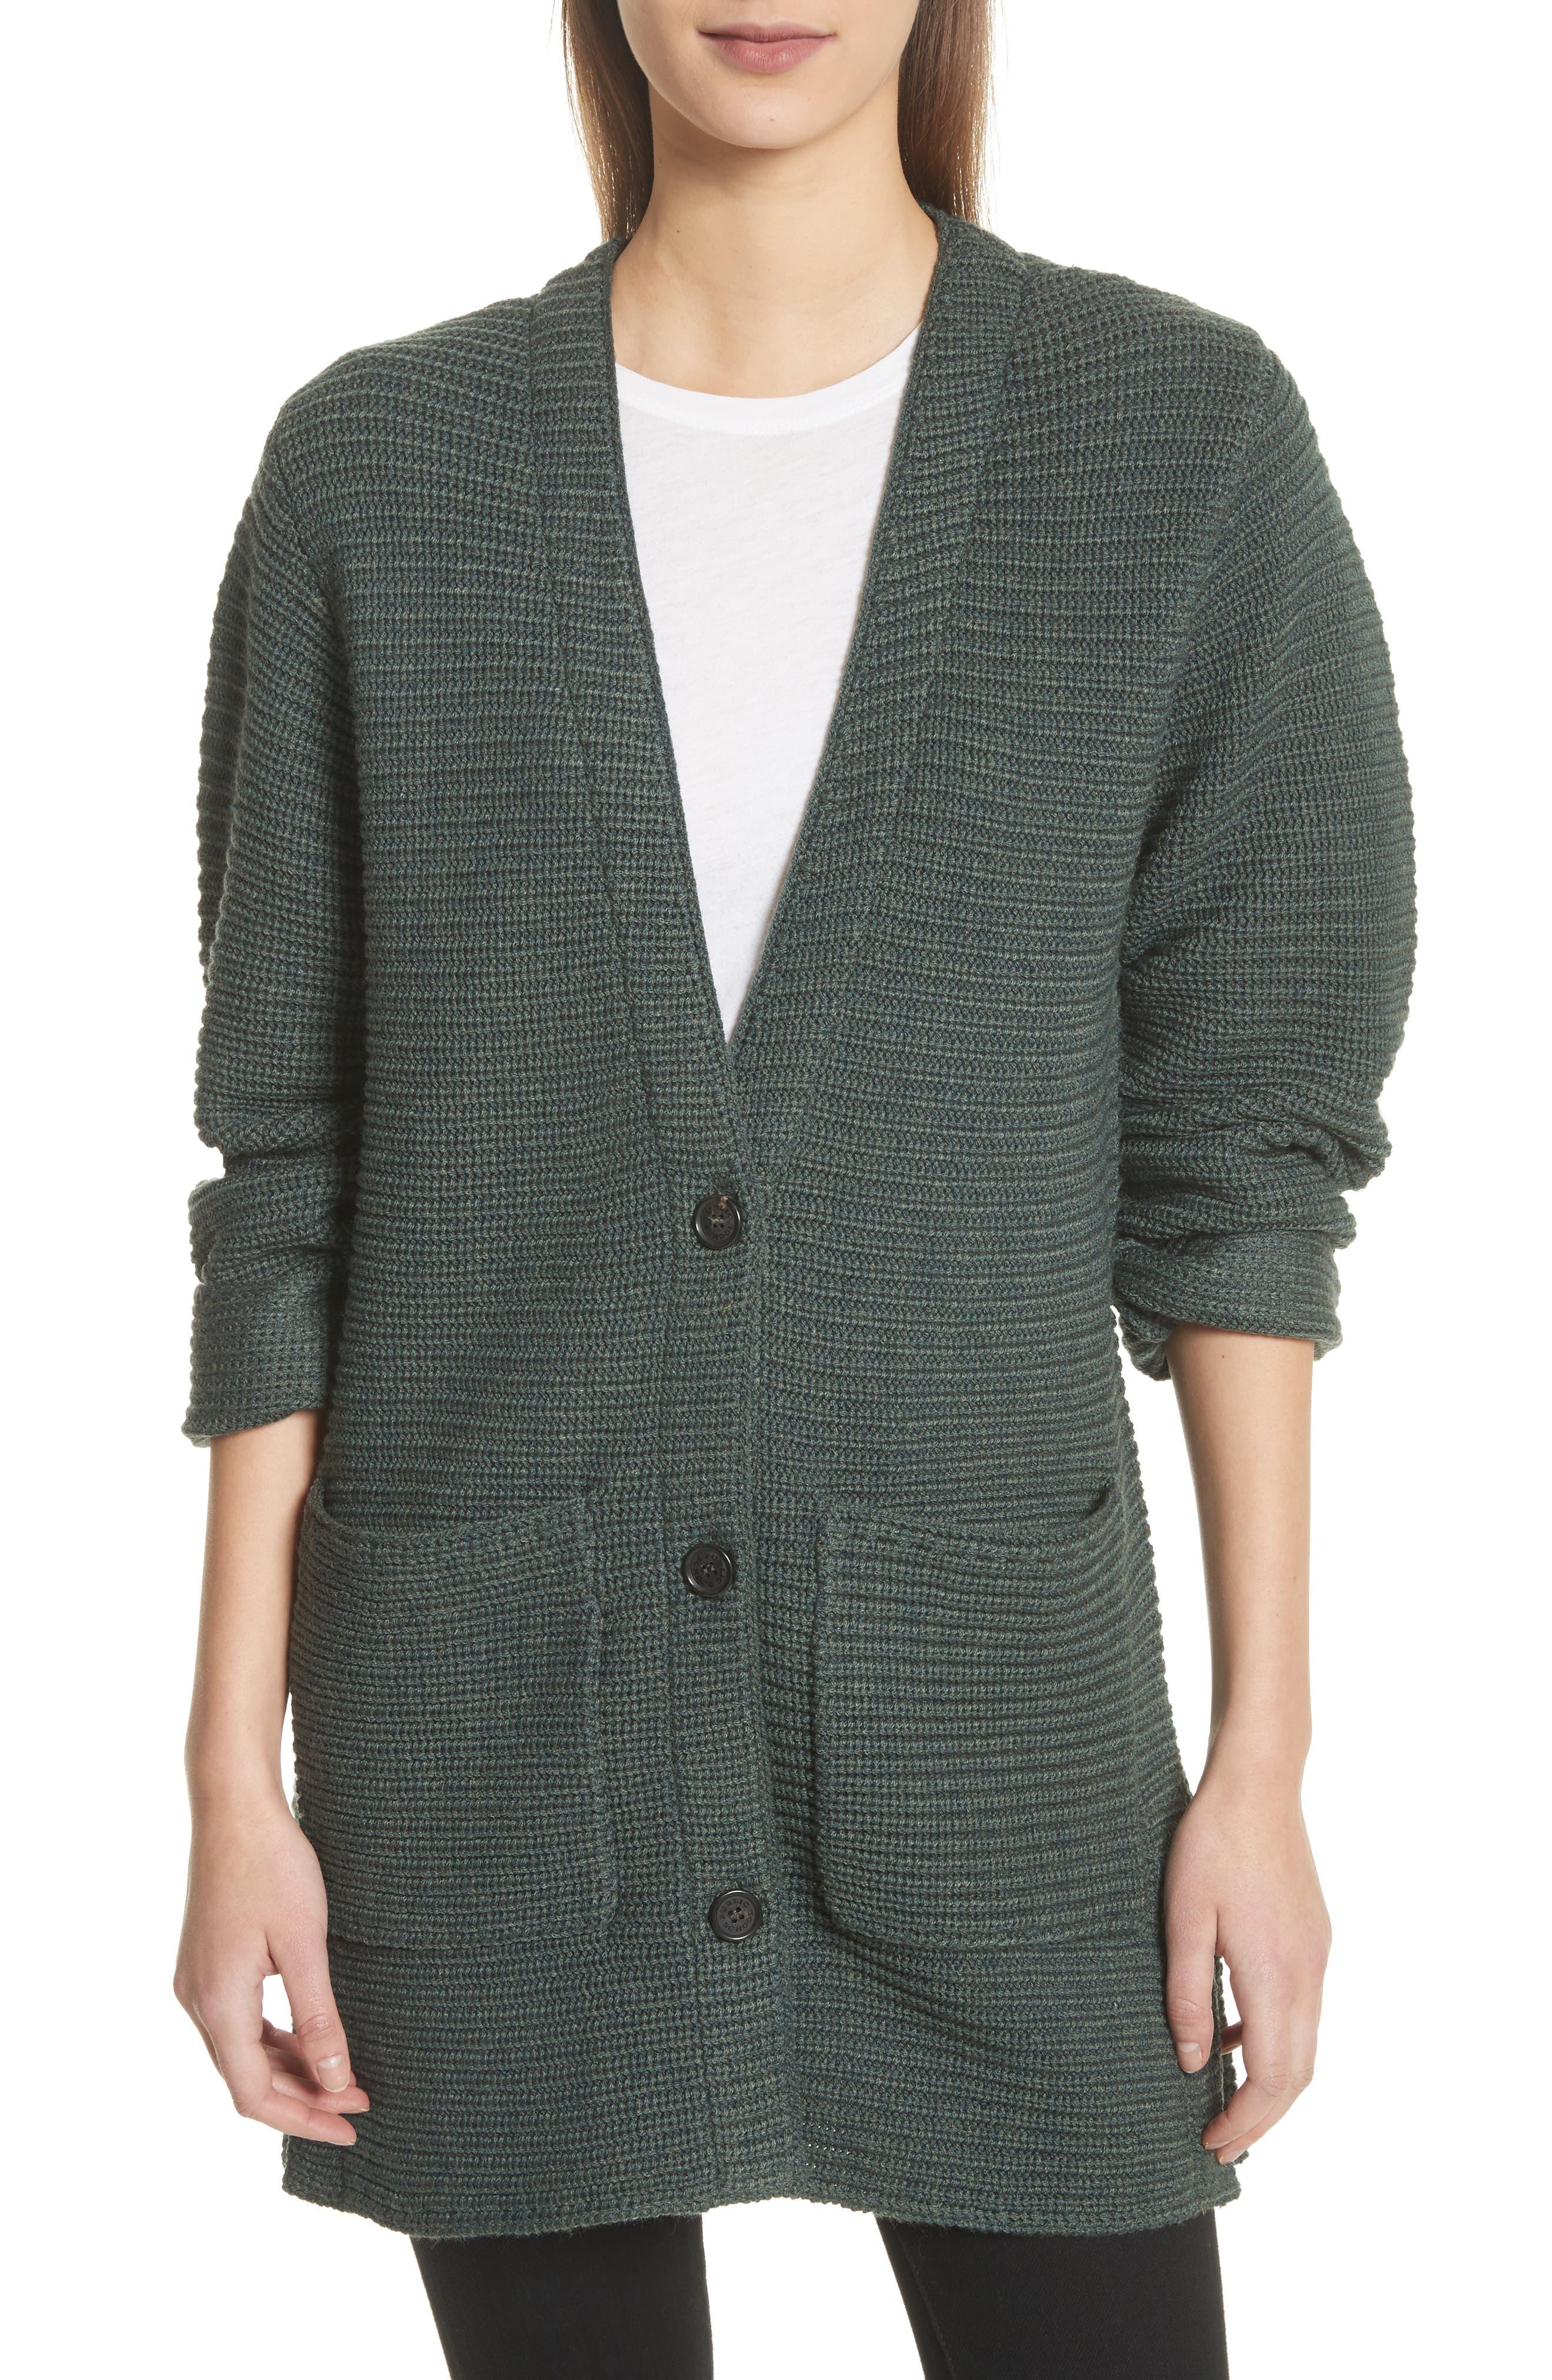 Fleta Merino Wool Blend Cardigan,                             Main thumbnail 1, color,                             300